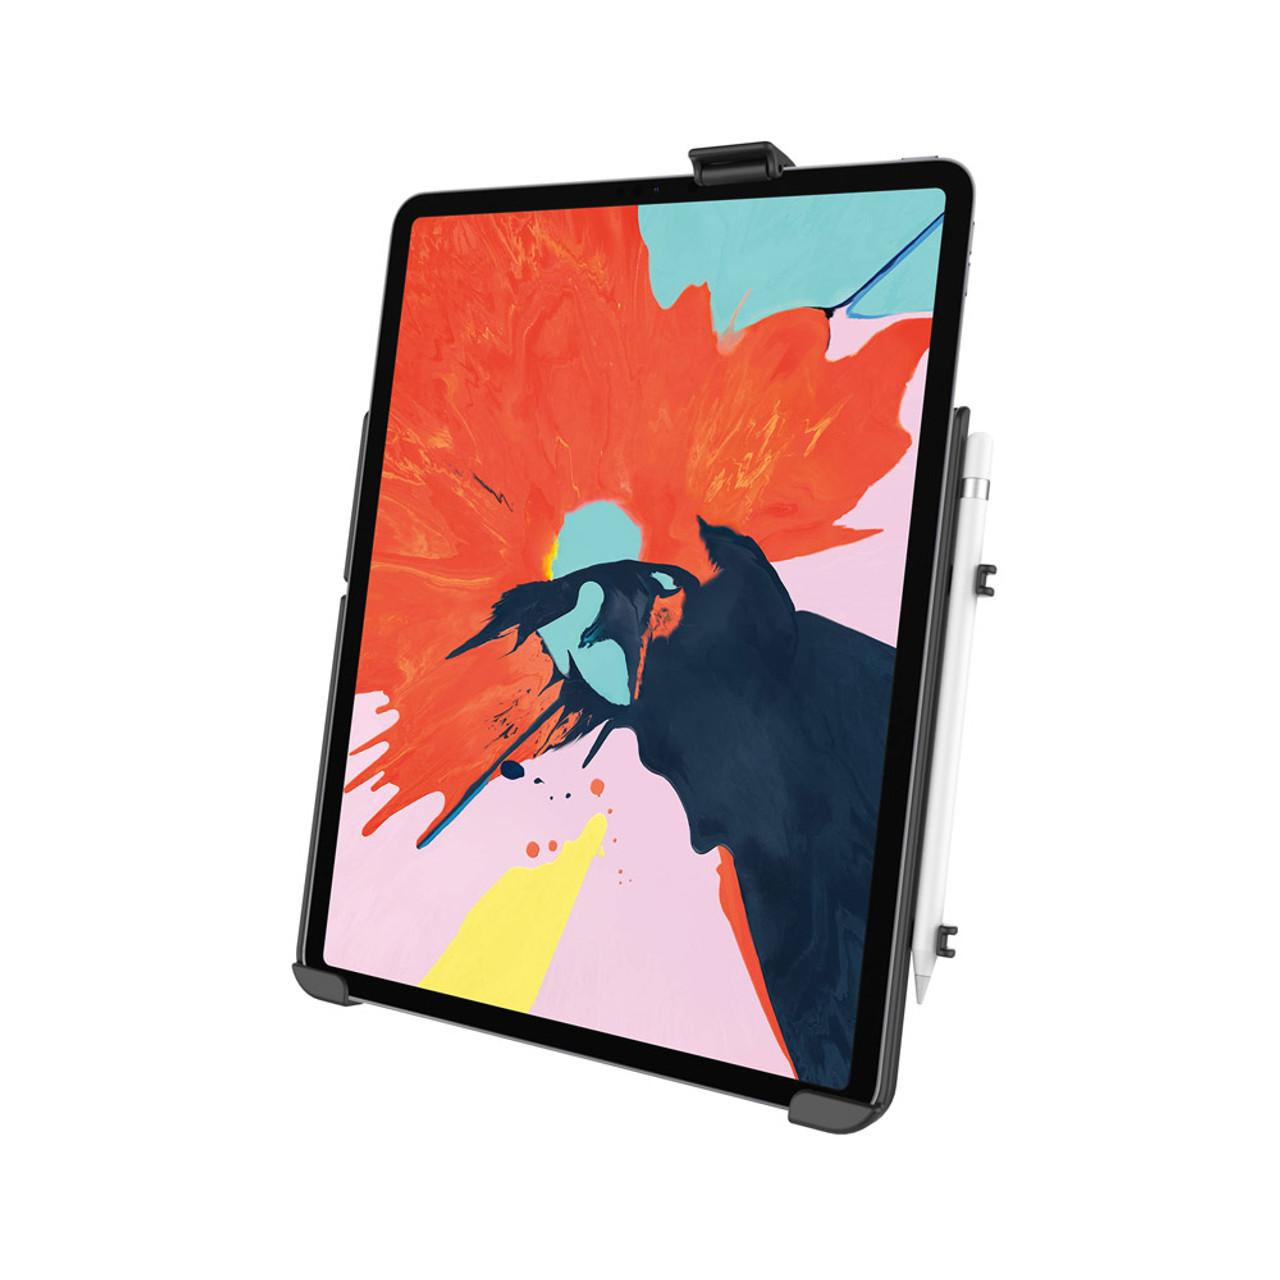 "RAM Mount EZ-Rollr Cradle f\/Apple iPad Pro 12.9"" 3rd Gen [RAM-HOL-AP24U]"